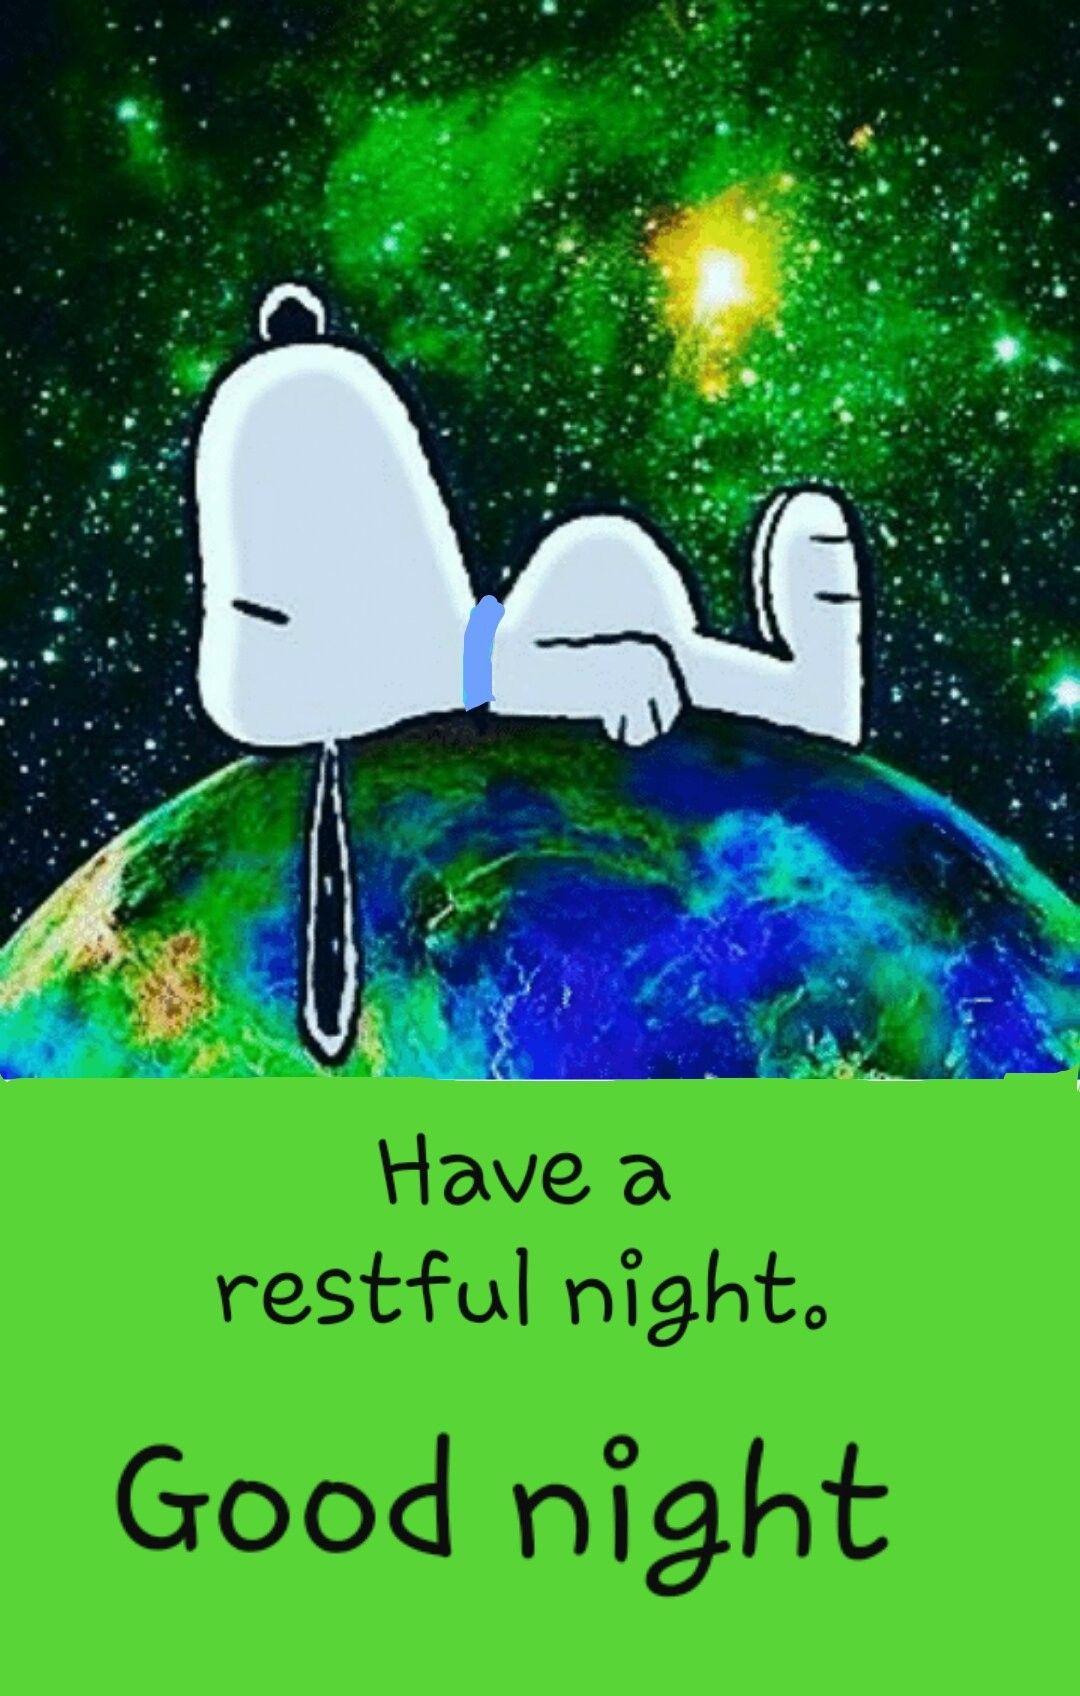 Restful Sleep Good Night Goodnight Snoopy Snoopy Love Snoopy Funny